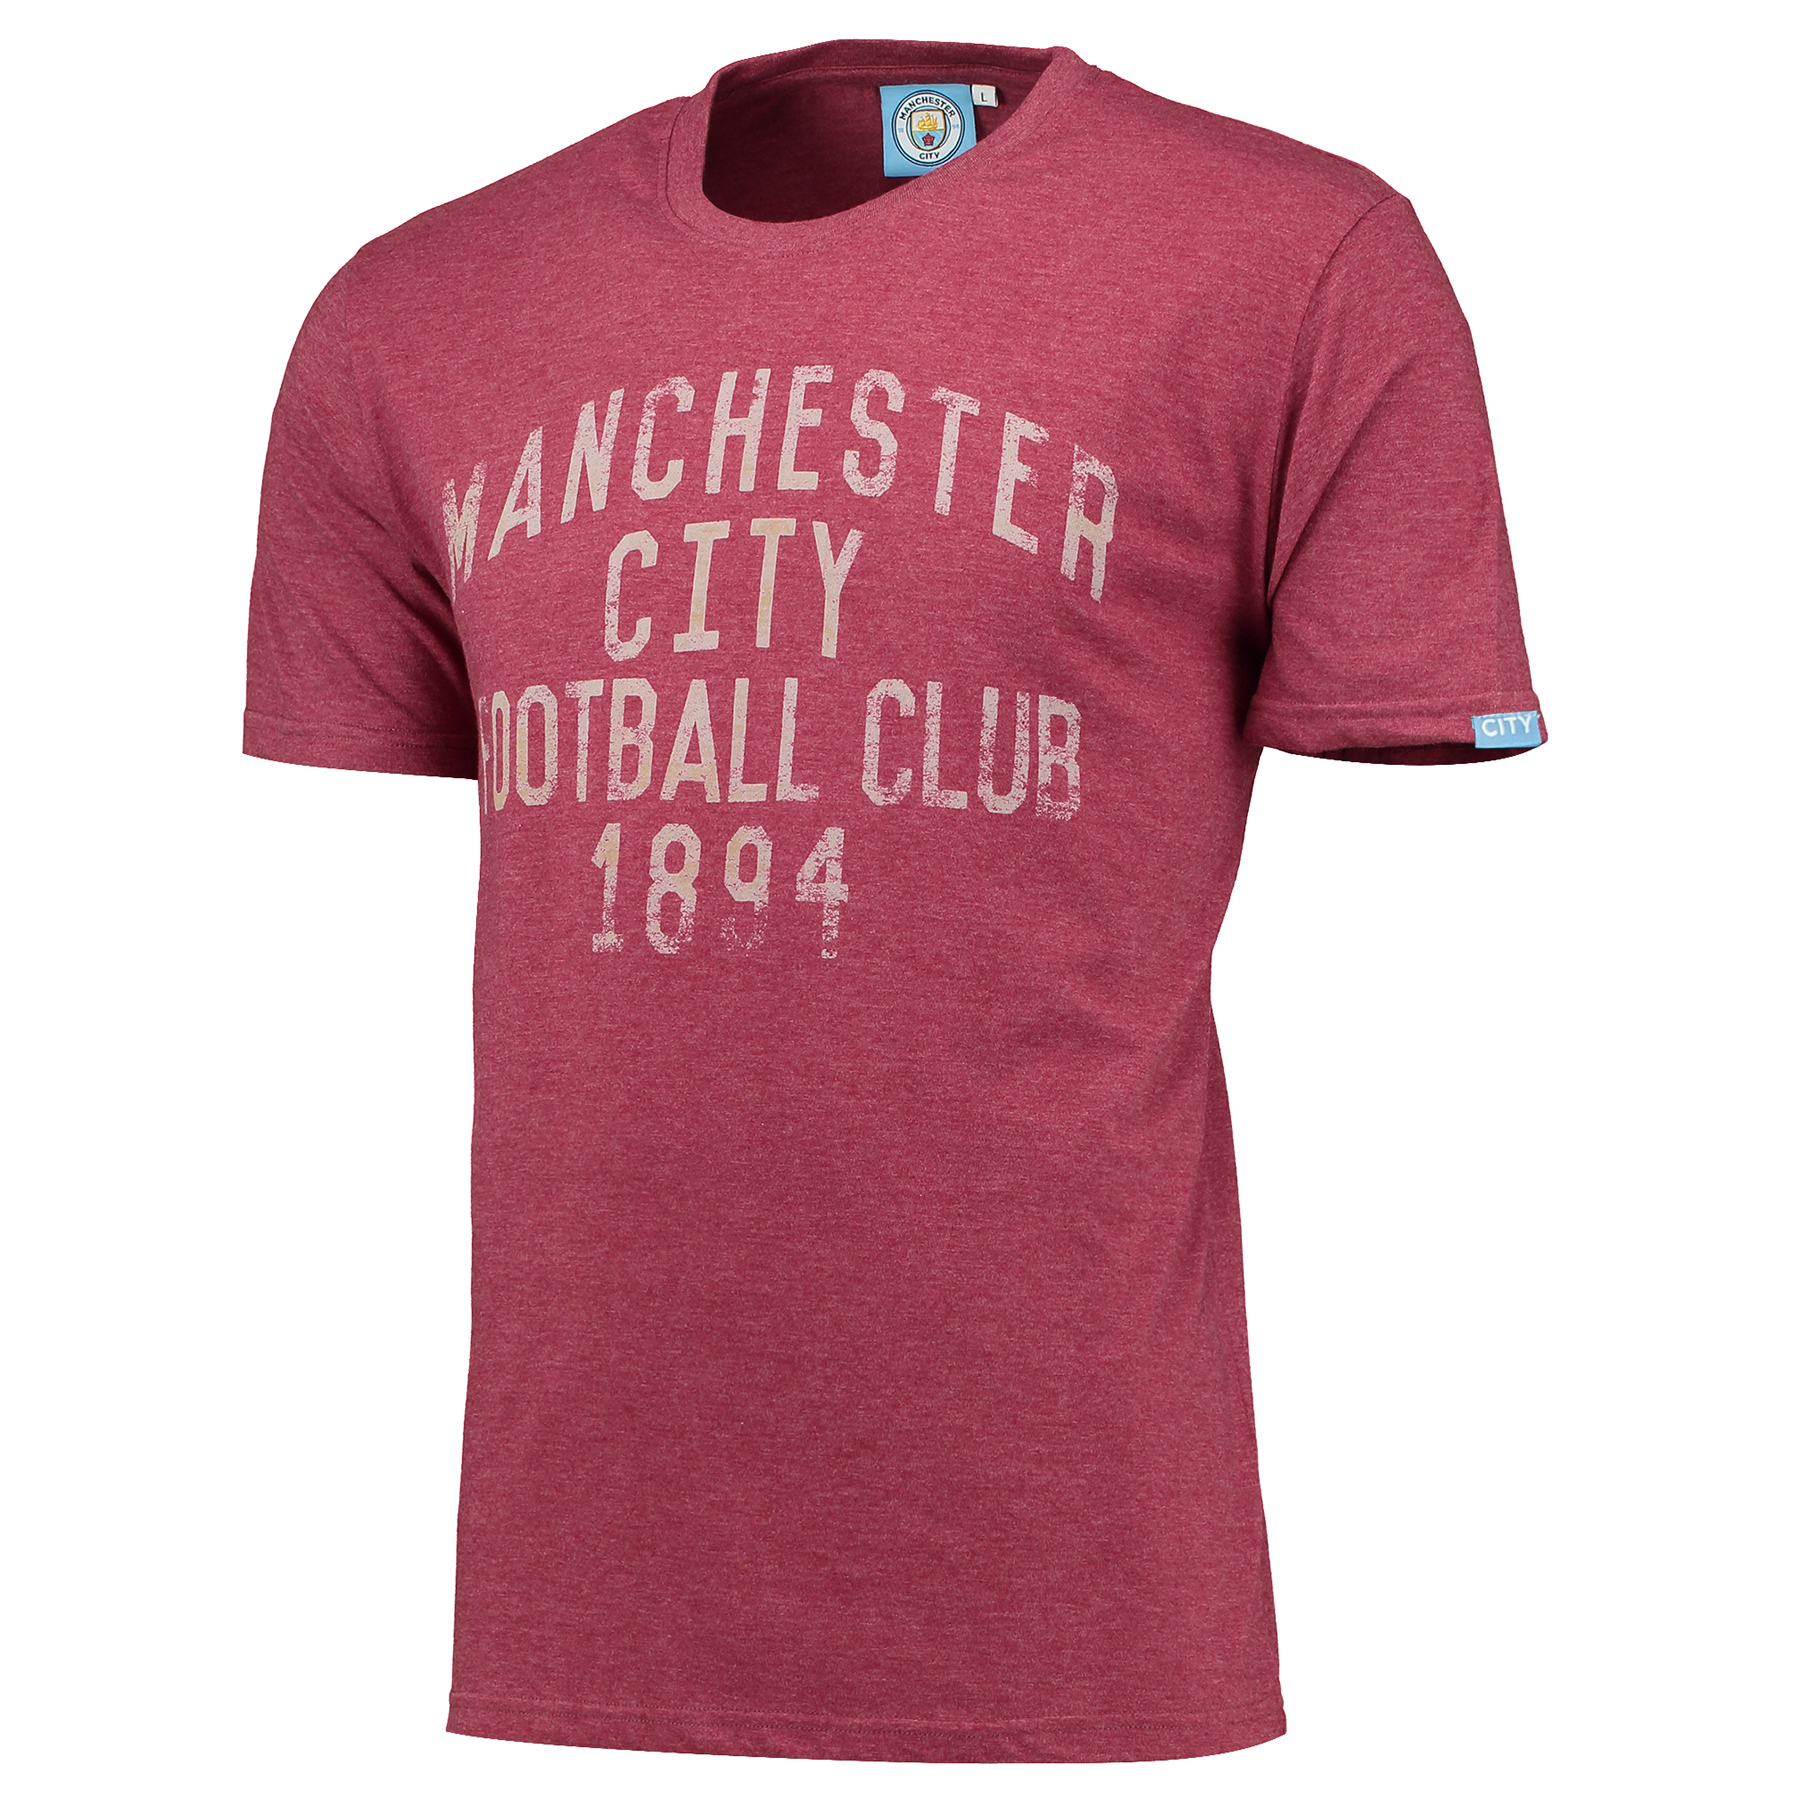 Manchester City Text T-Shirt - Maroon Marl